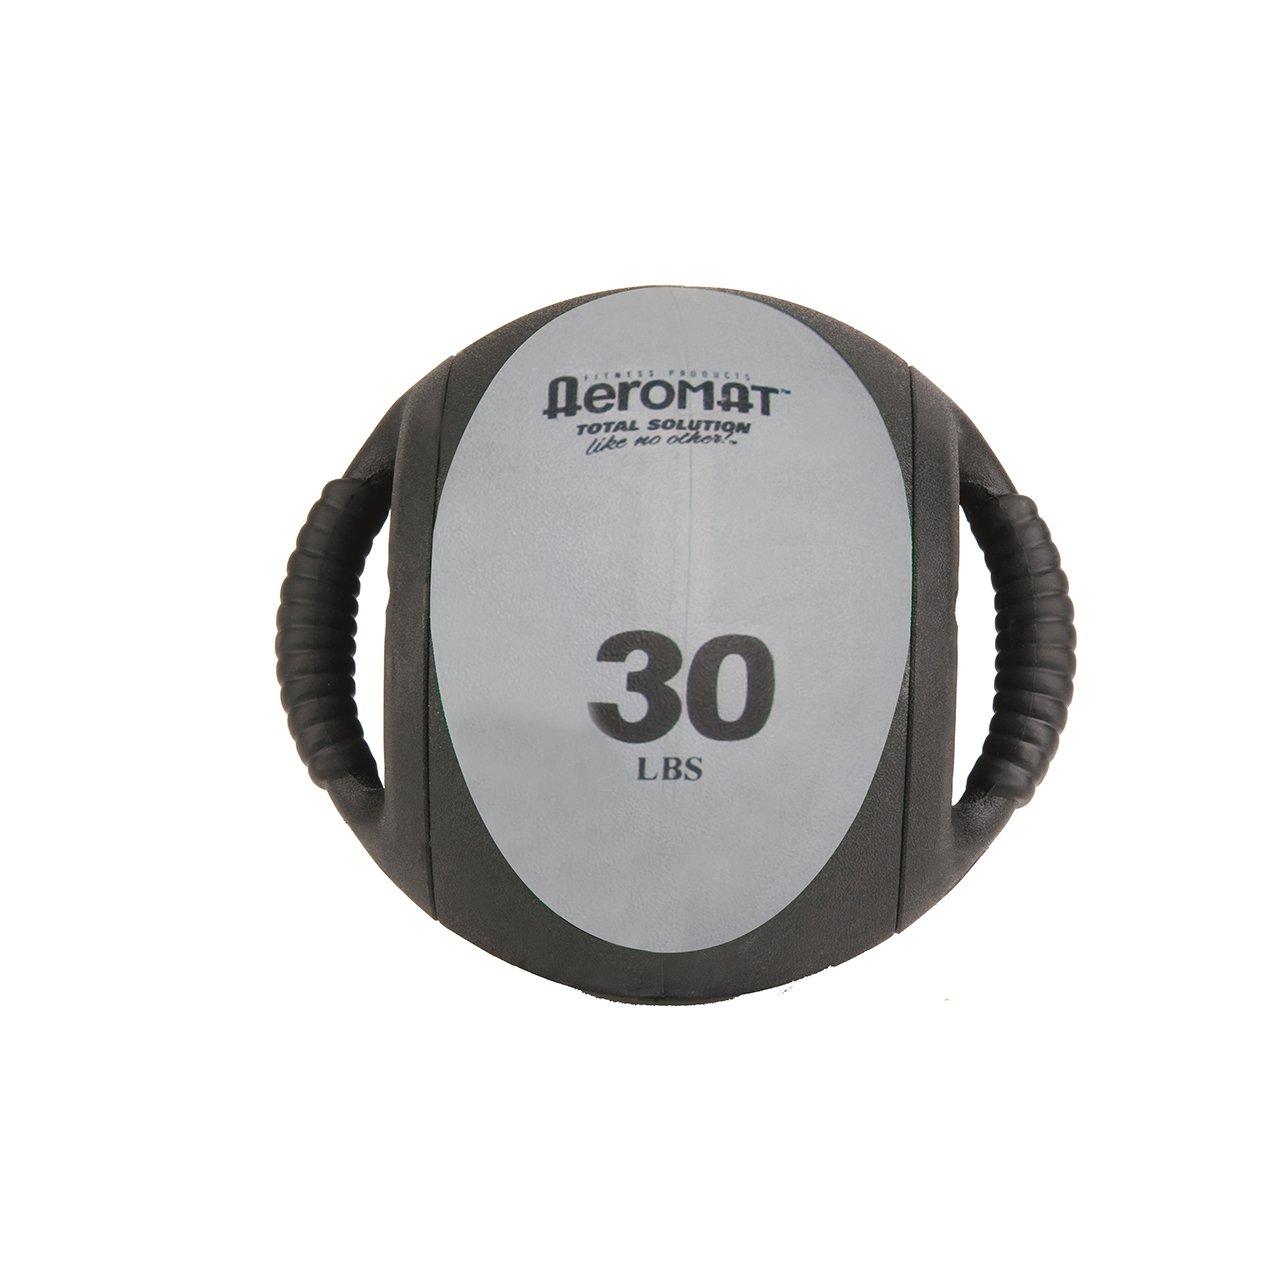 Aeromat Dual Grip Power Medicine Ball, 9cm/30-Pound, Black/Gray